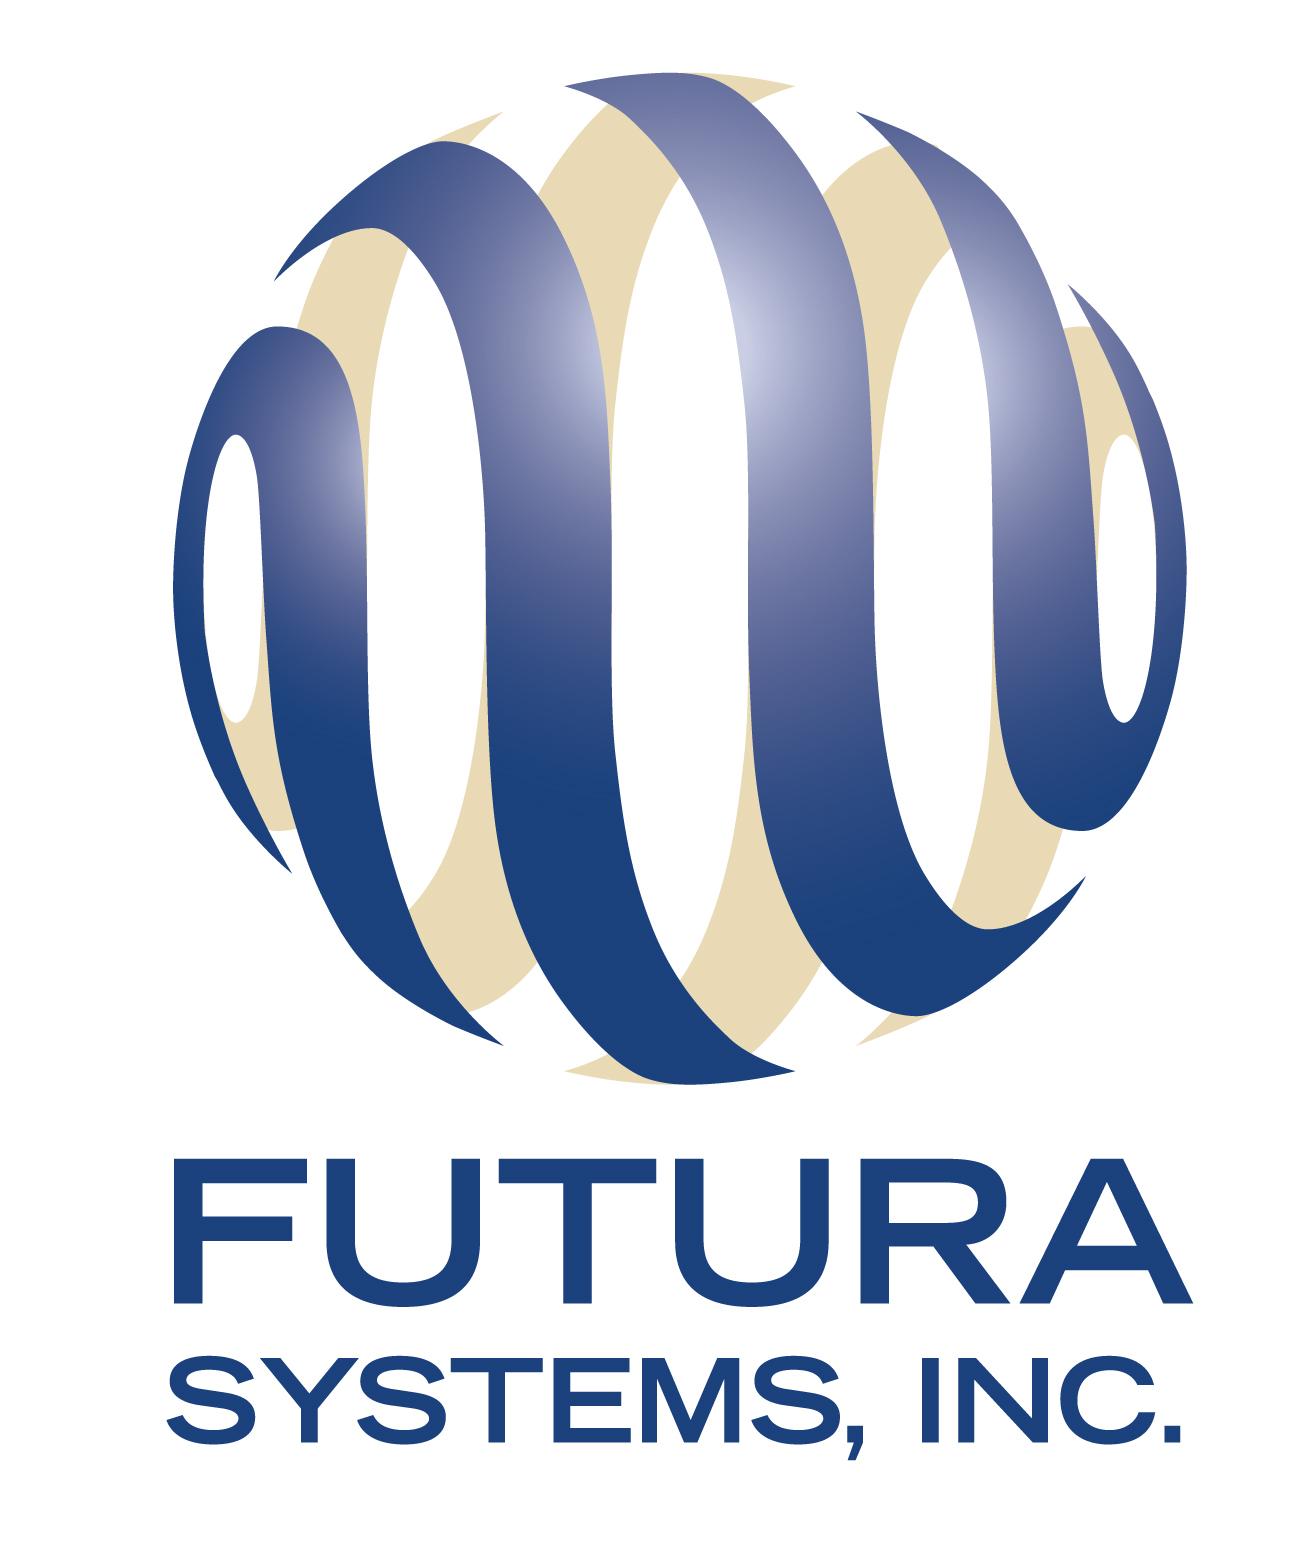 Futura Systems Inc-947.jpg